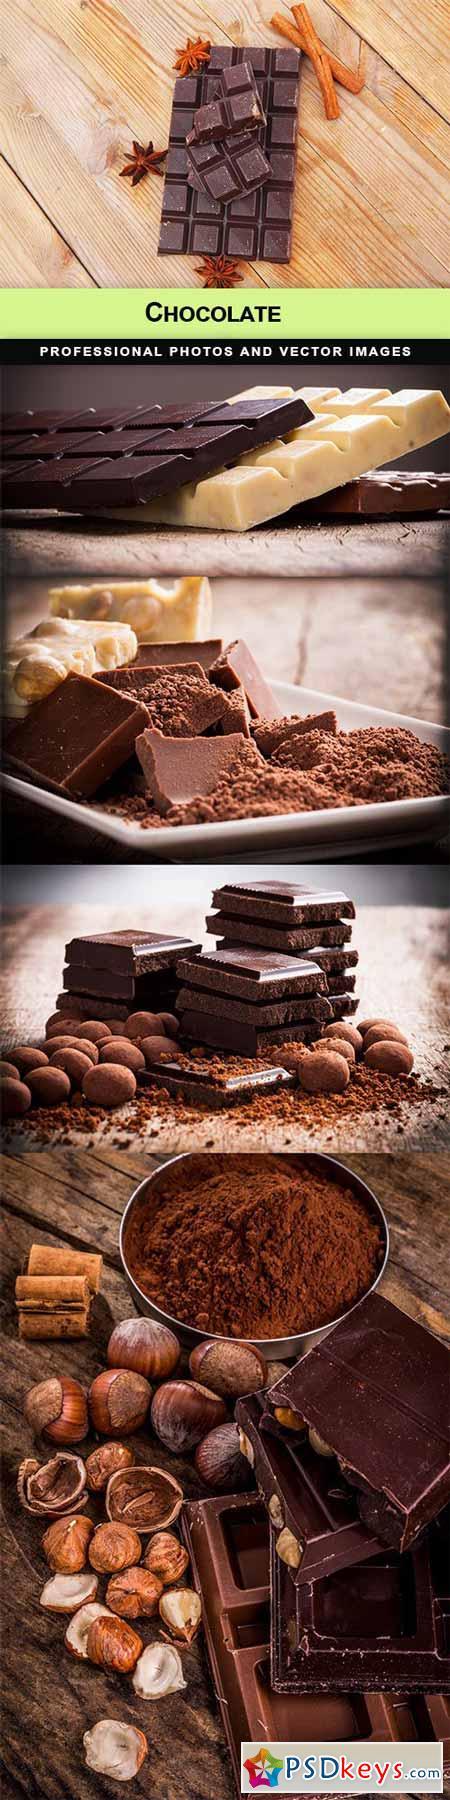 Chocolate - 5 UHQ JPEG